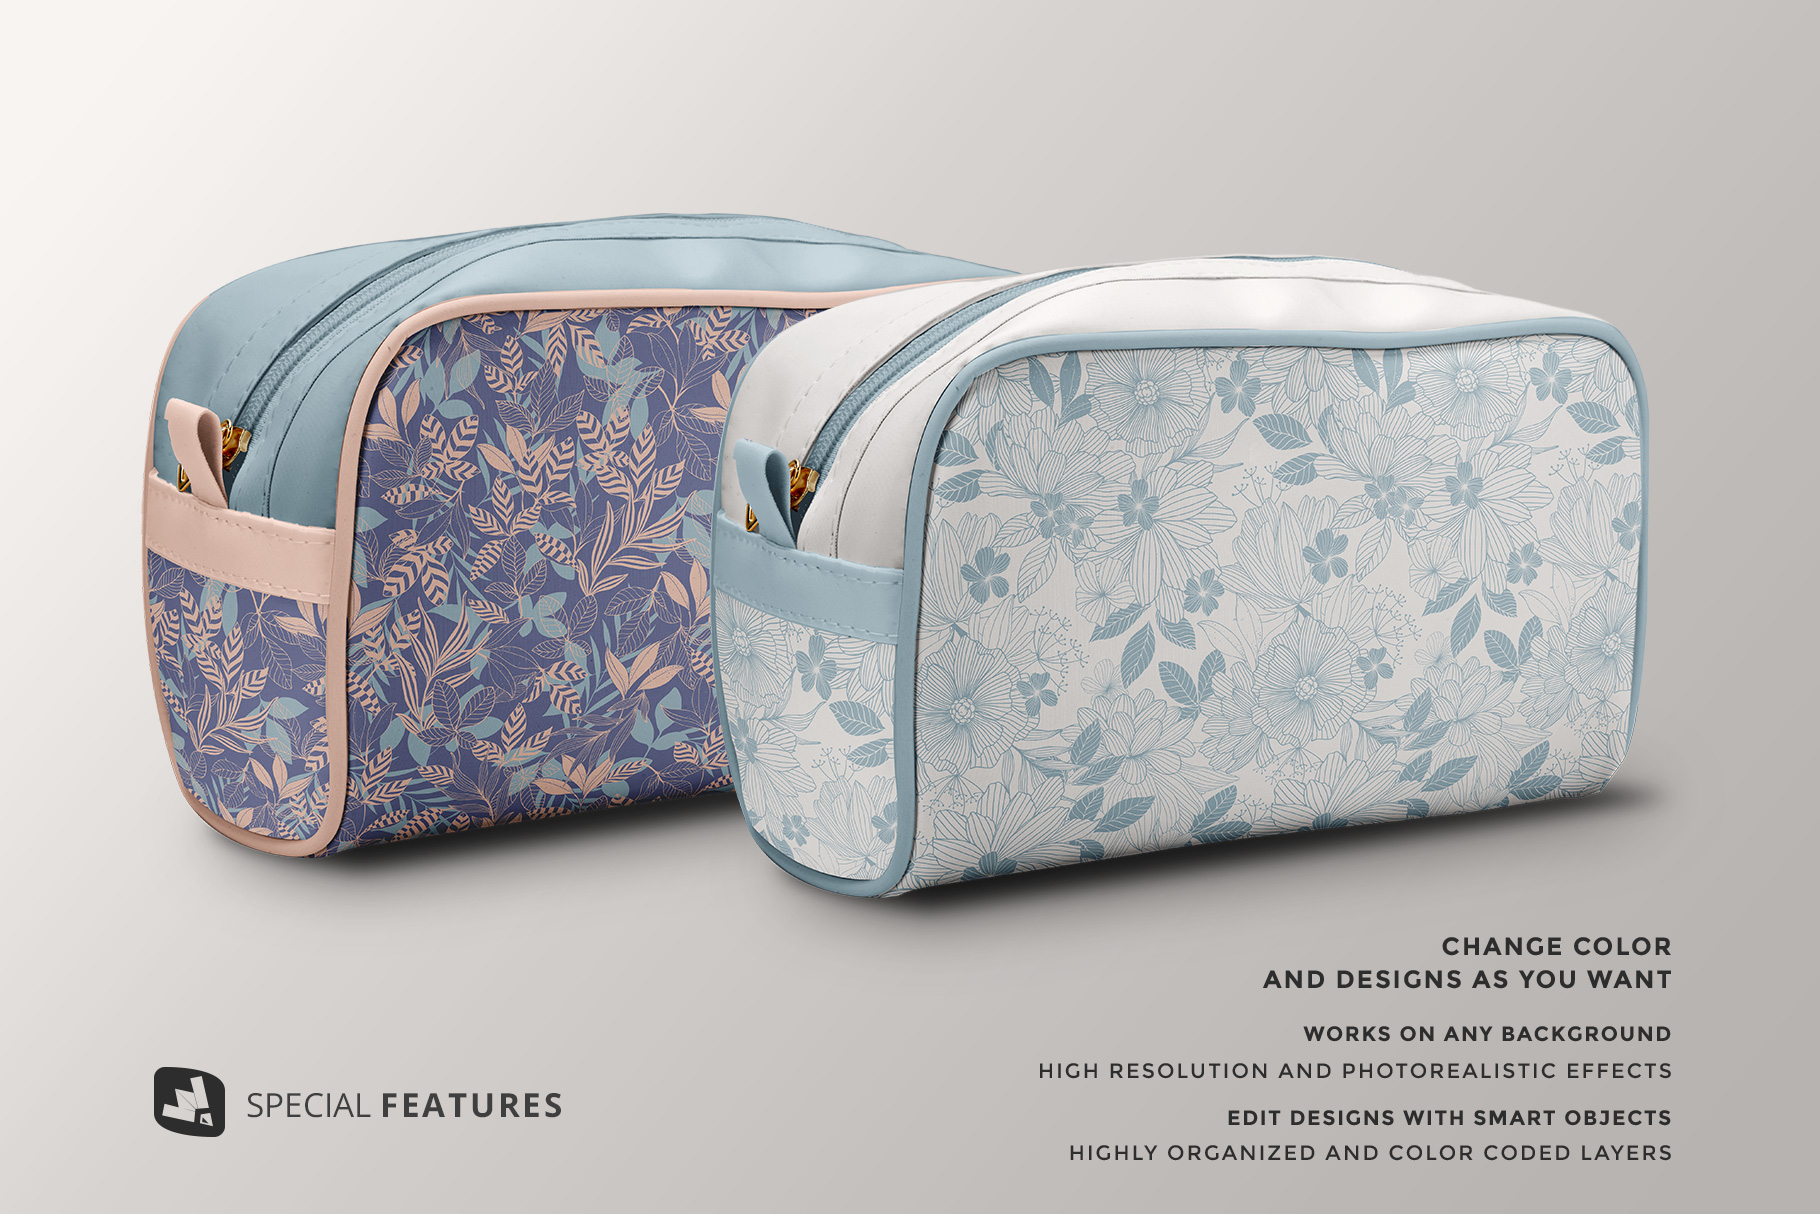 designer's credit of the front view travel makeup bag mockup